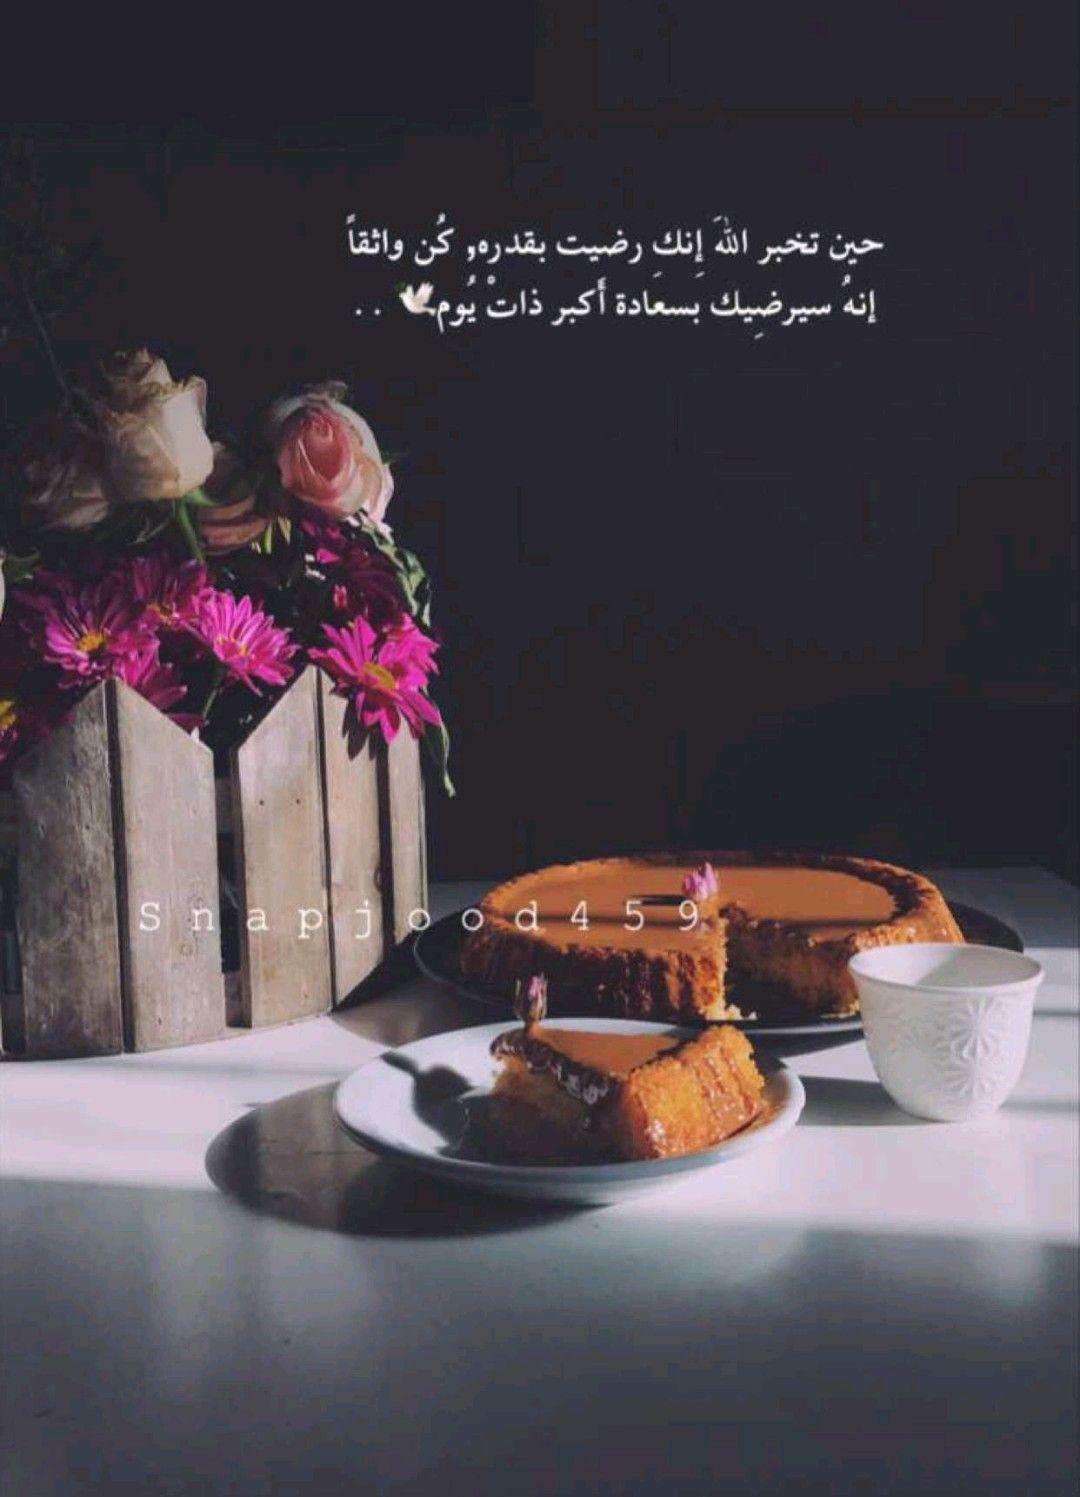 الرضا بالقضاء والقدر Romantic Words Cool Words Arabic Quotes